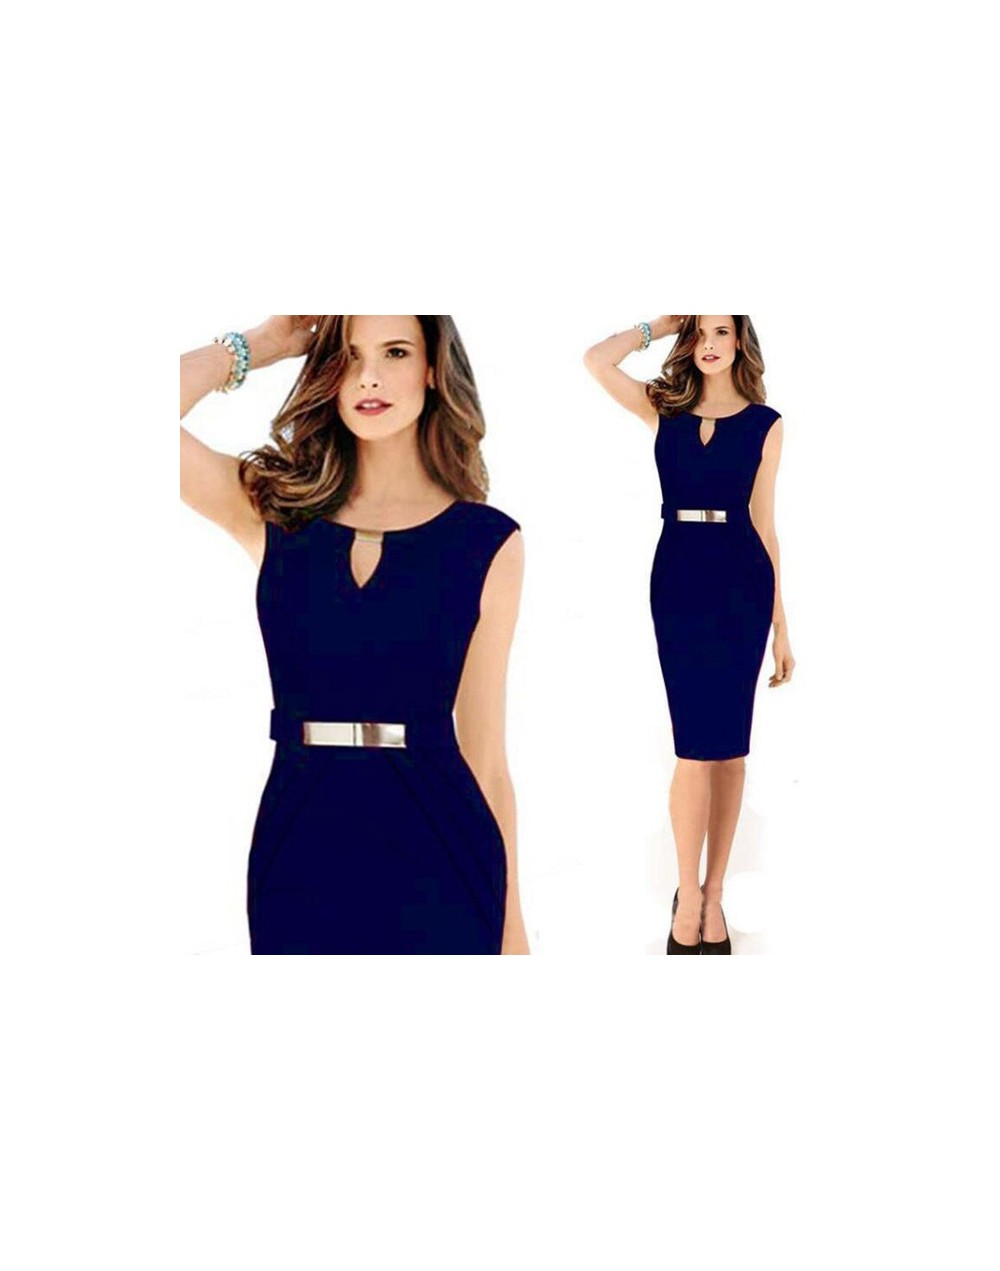 Vestidos Feminina Causal Summer Dress 2016 Women Fashion Bodycon Office O Neck Sleeveless Lady Sheath Pencil Dress Plus Size...